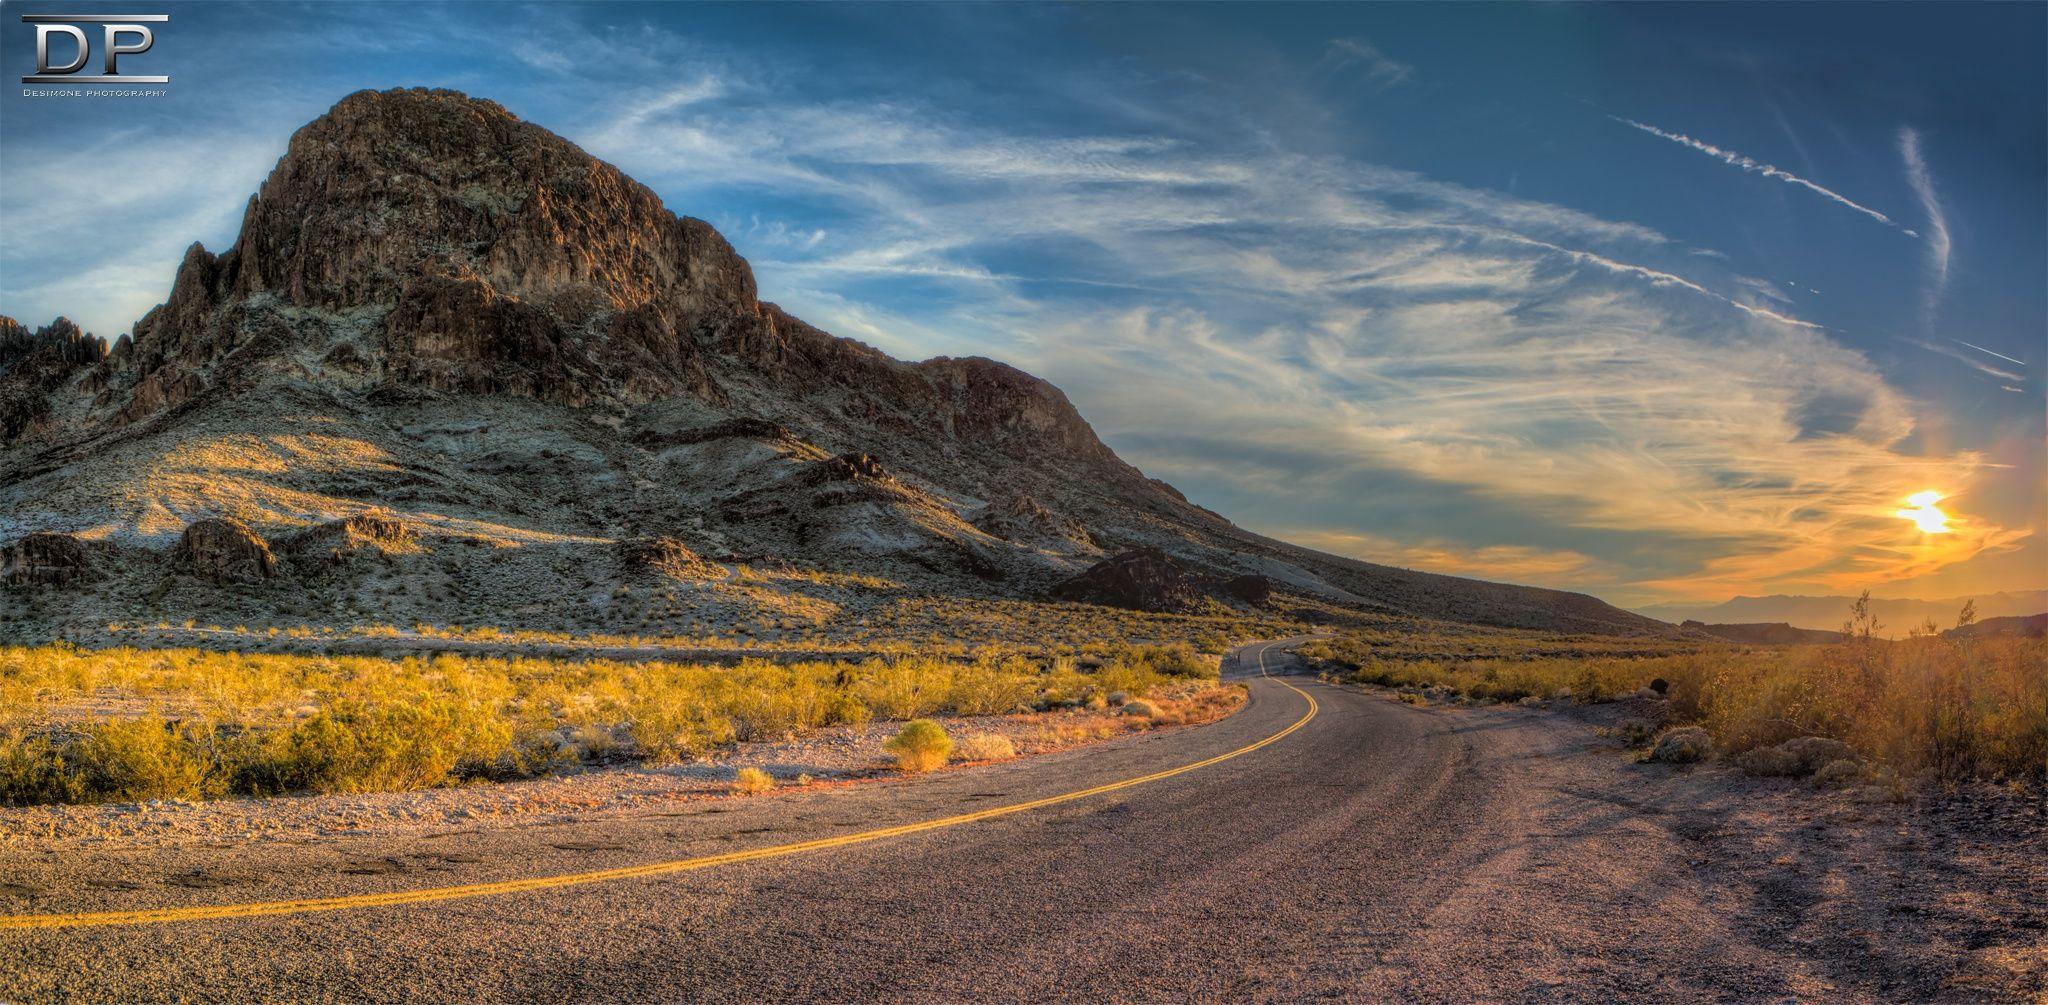 Route 66 by Leon DeSimone on 500px